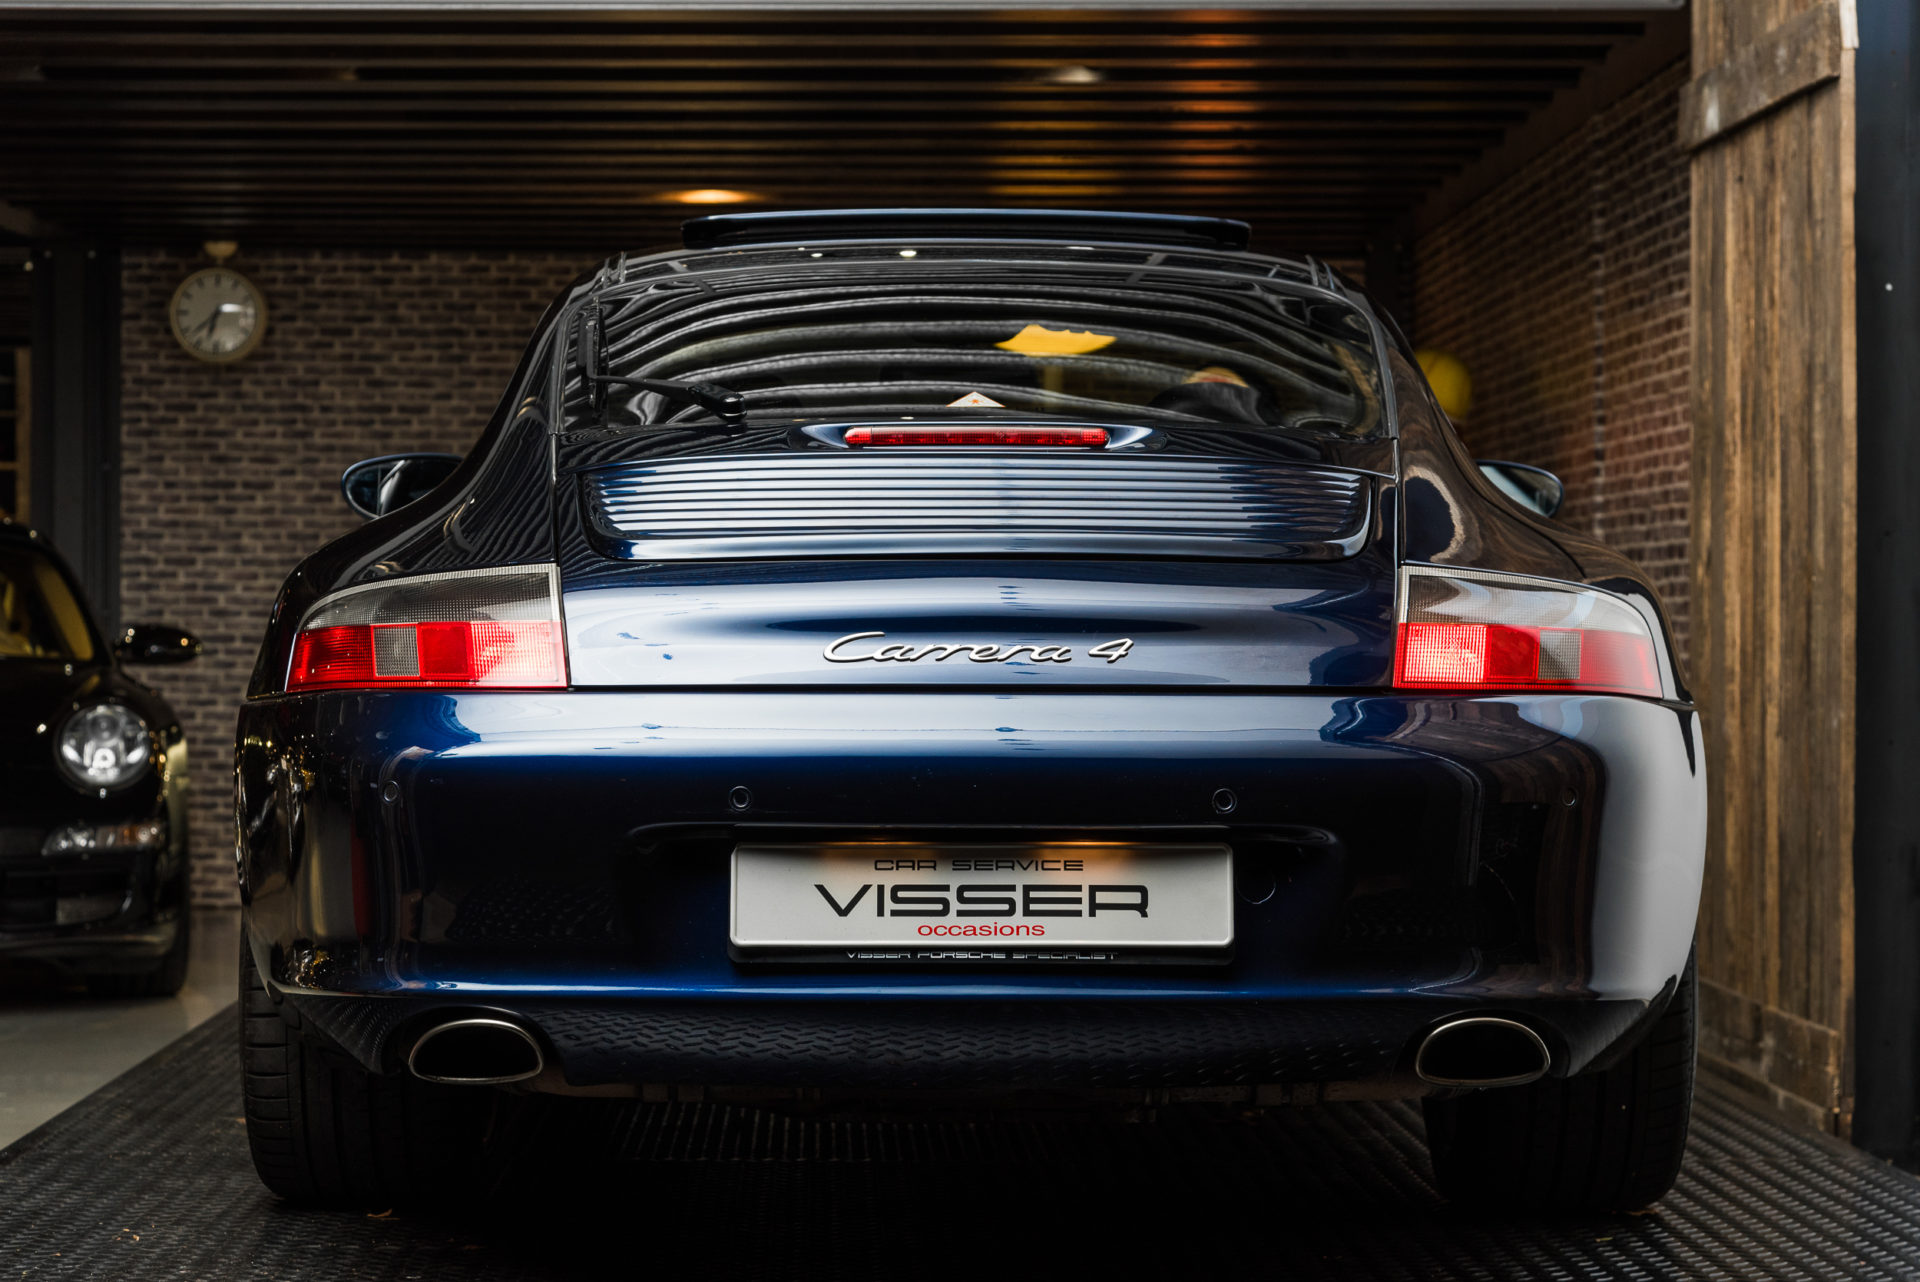 Porsche 996 Carrera 4 - 1